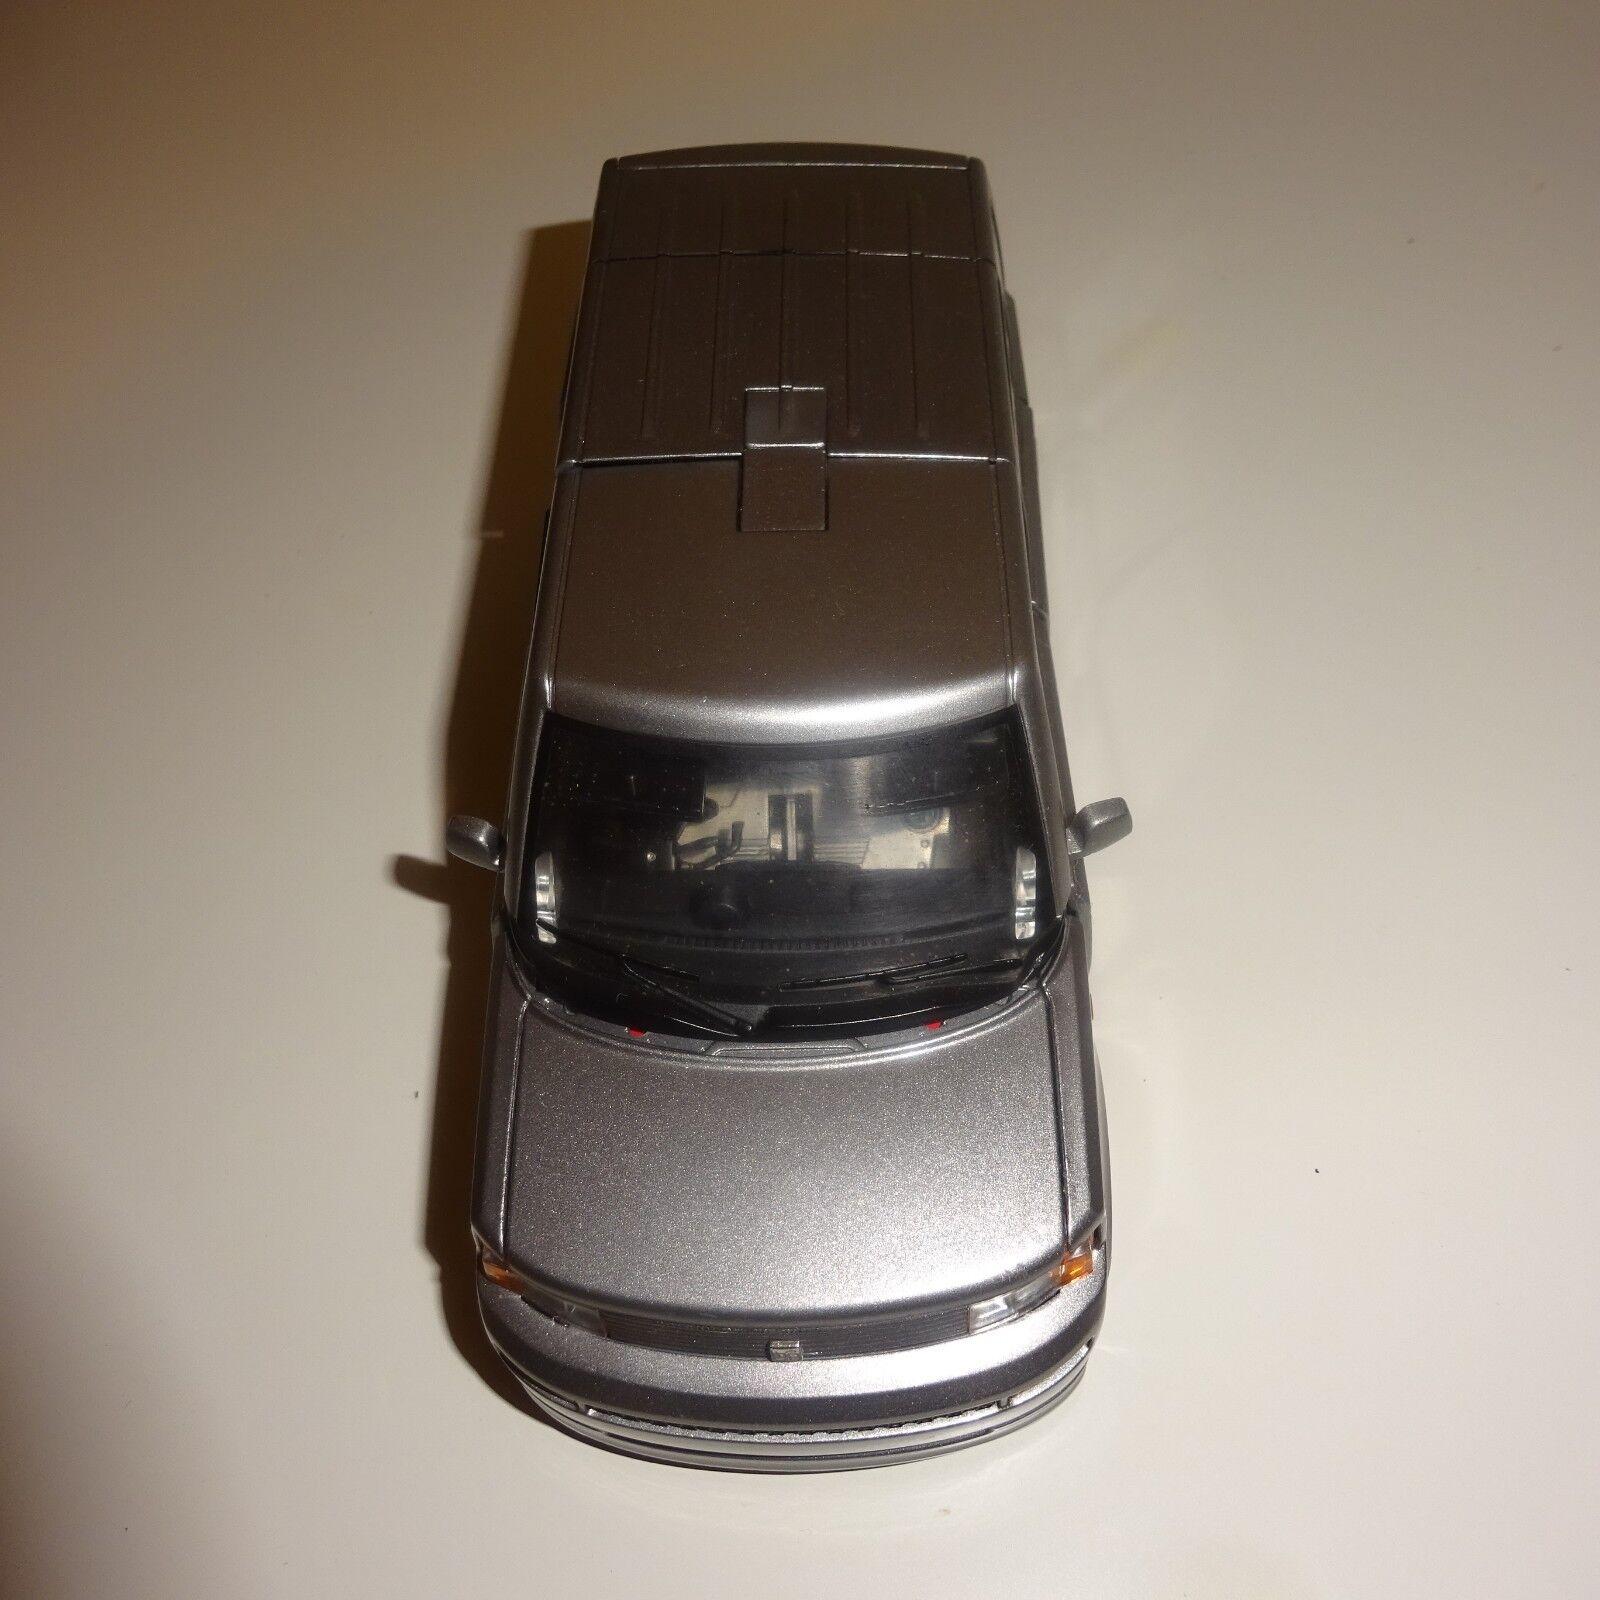 Transformers Takara Binaltech Car - Asterisk BTA-03 Broadblast Feat Toyota